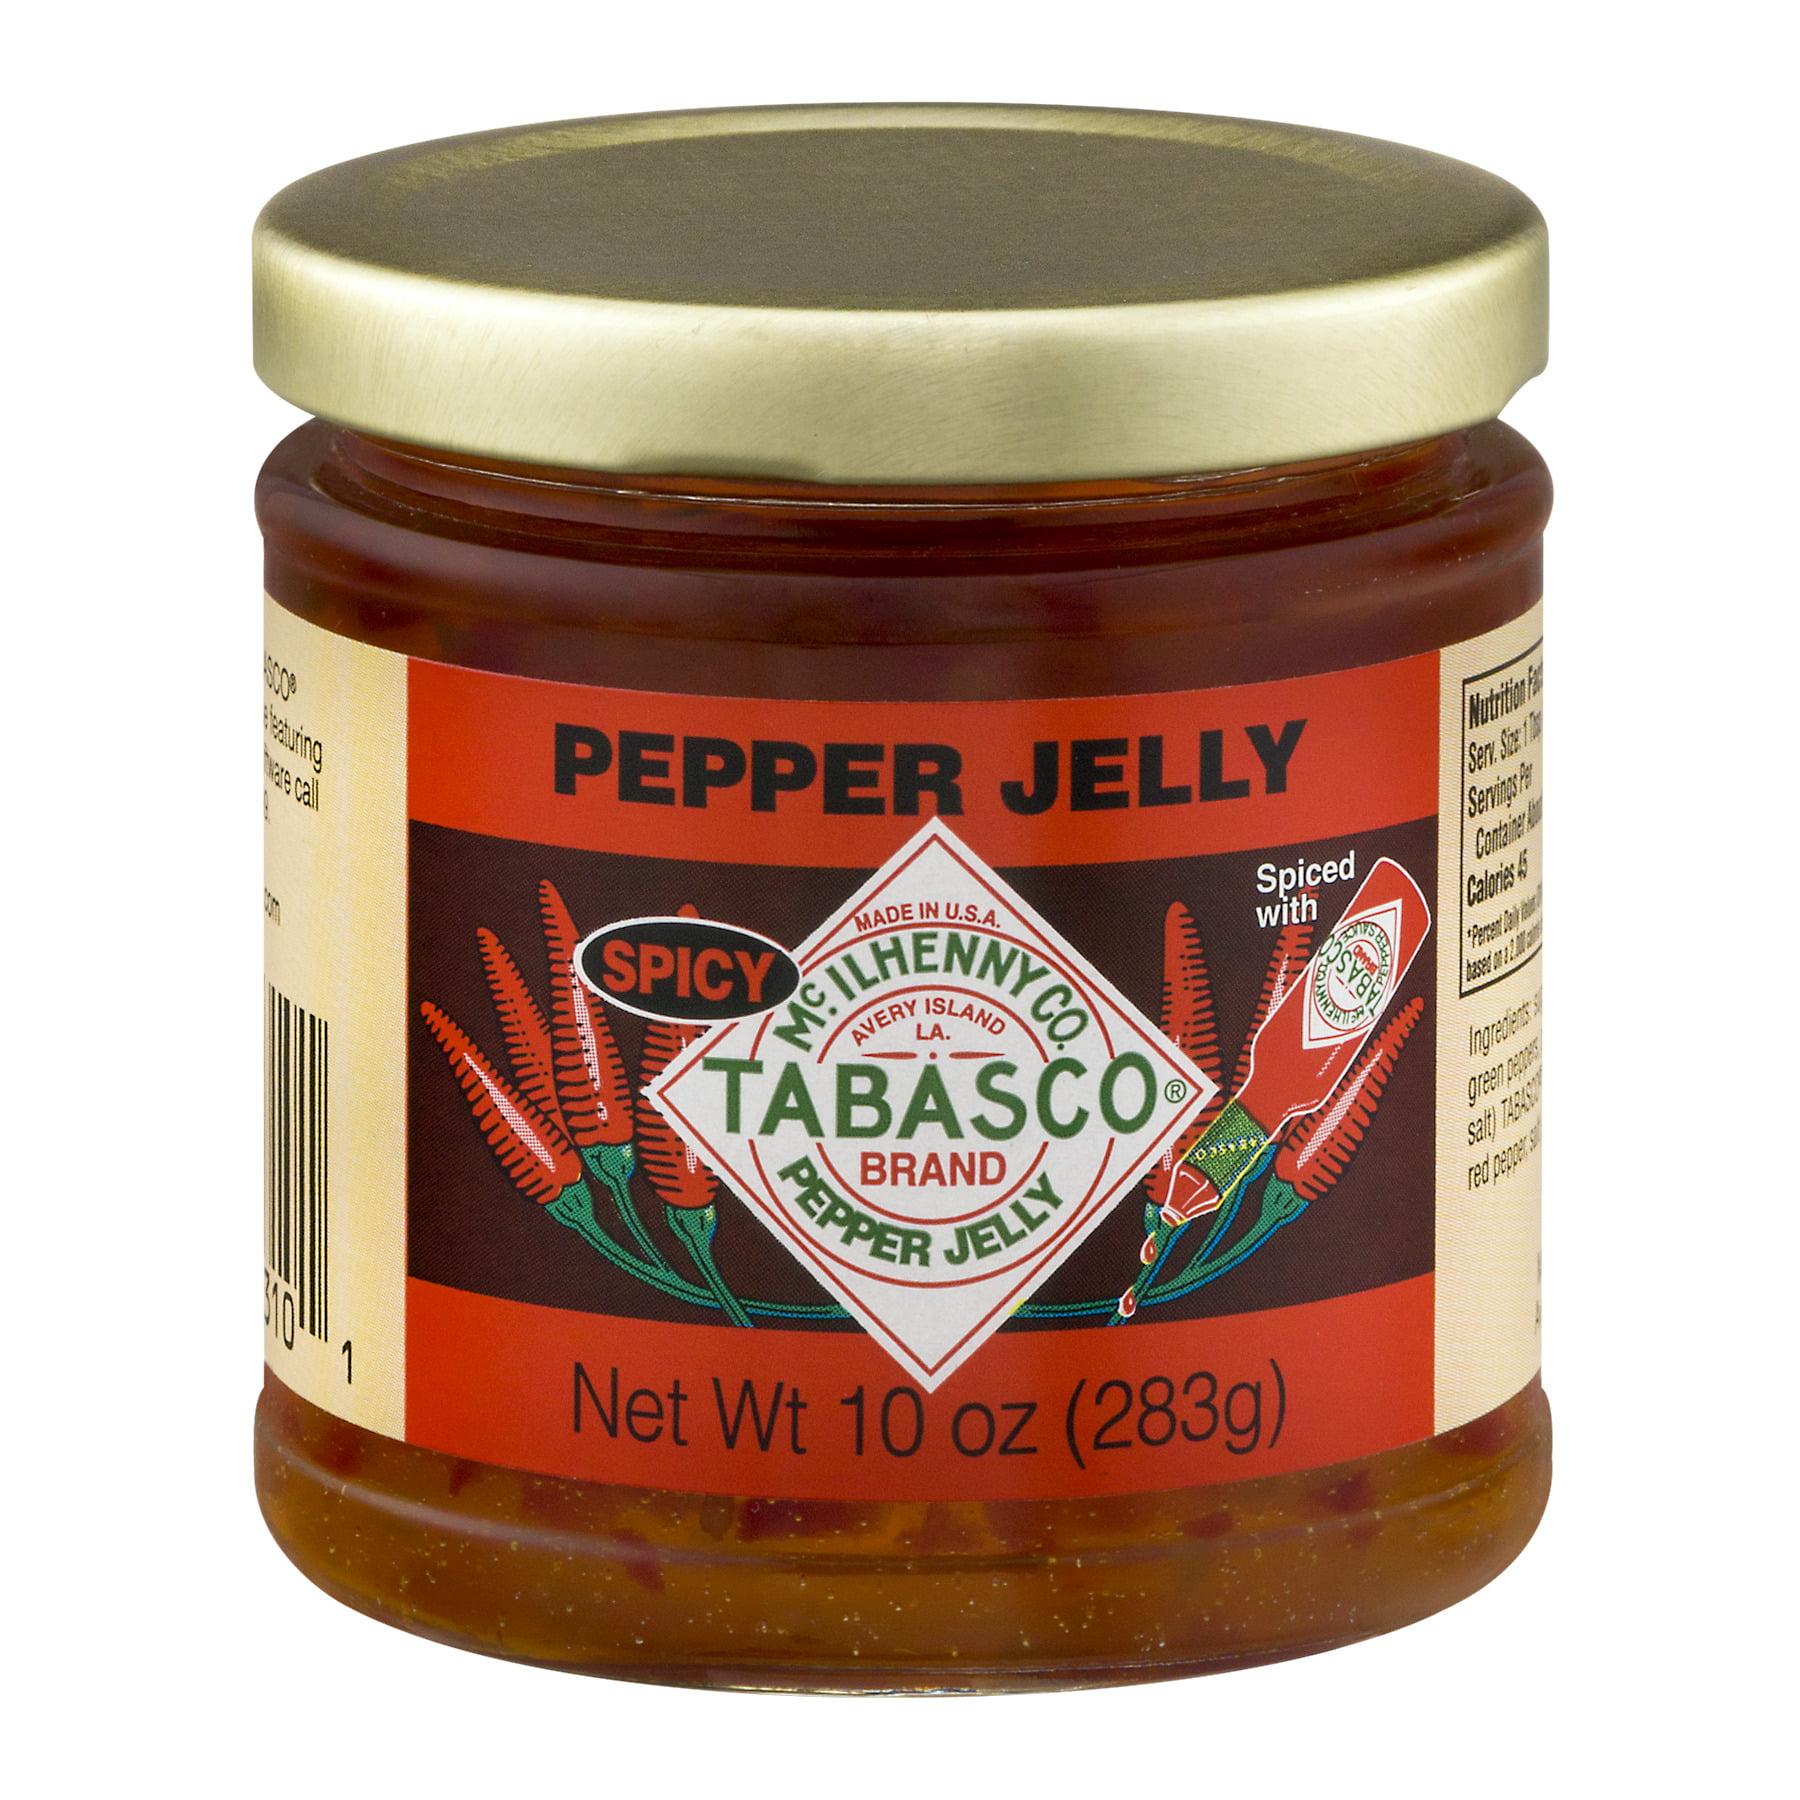 Tabasco: Spicy Pepper Jelly, 10 Oz